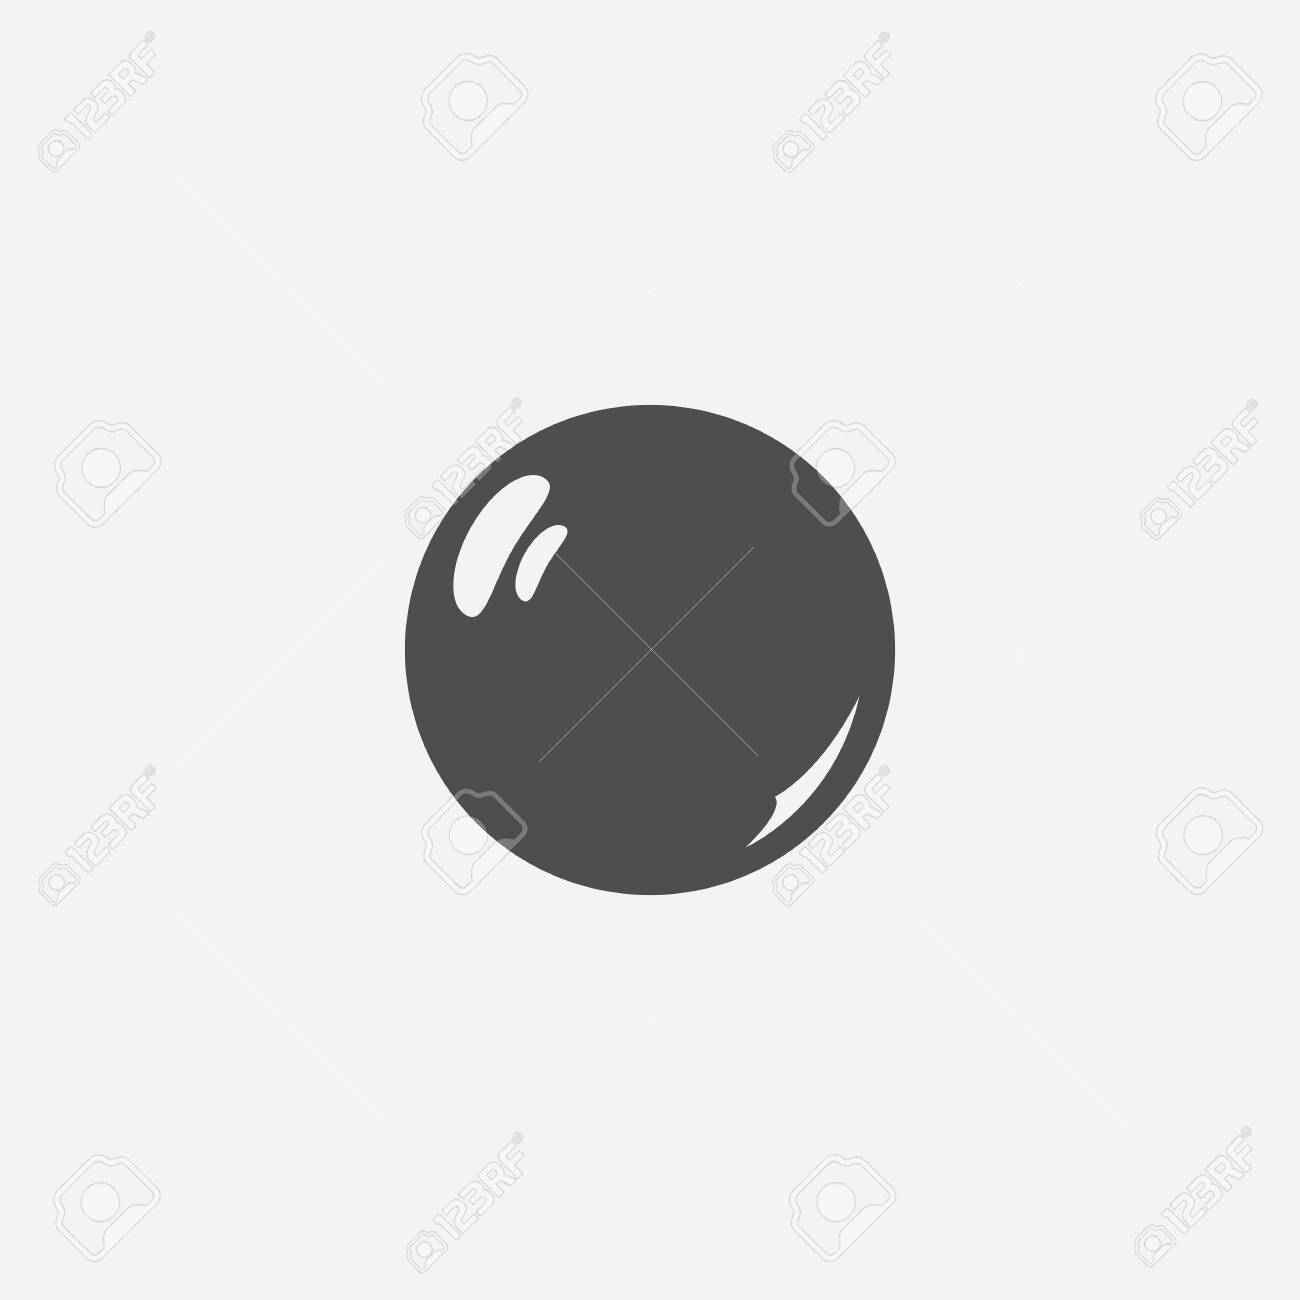 pearl icon - 143059727